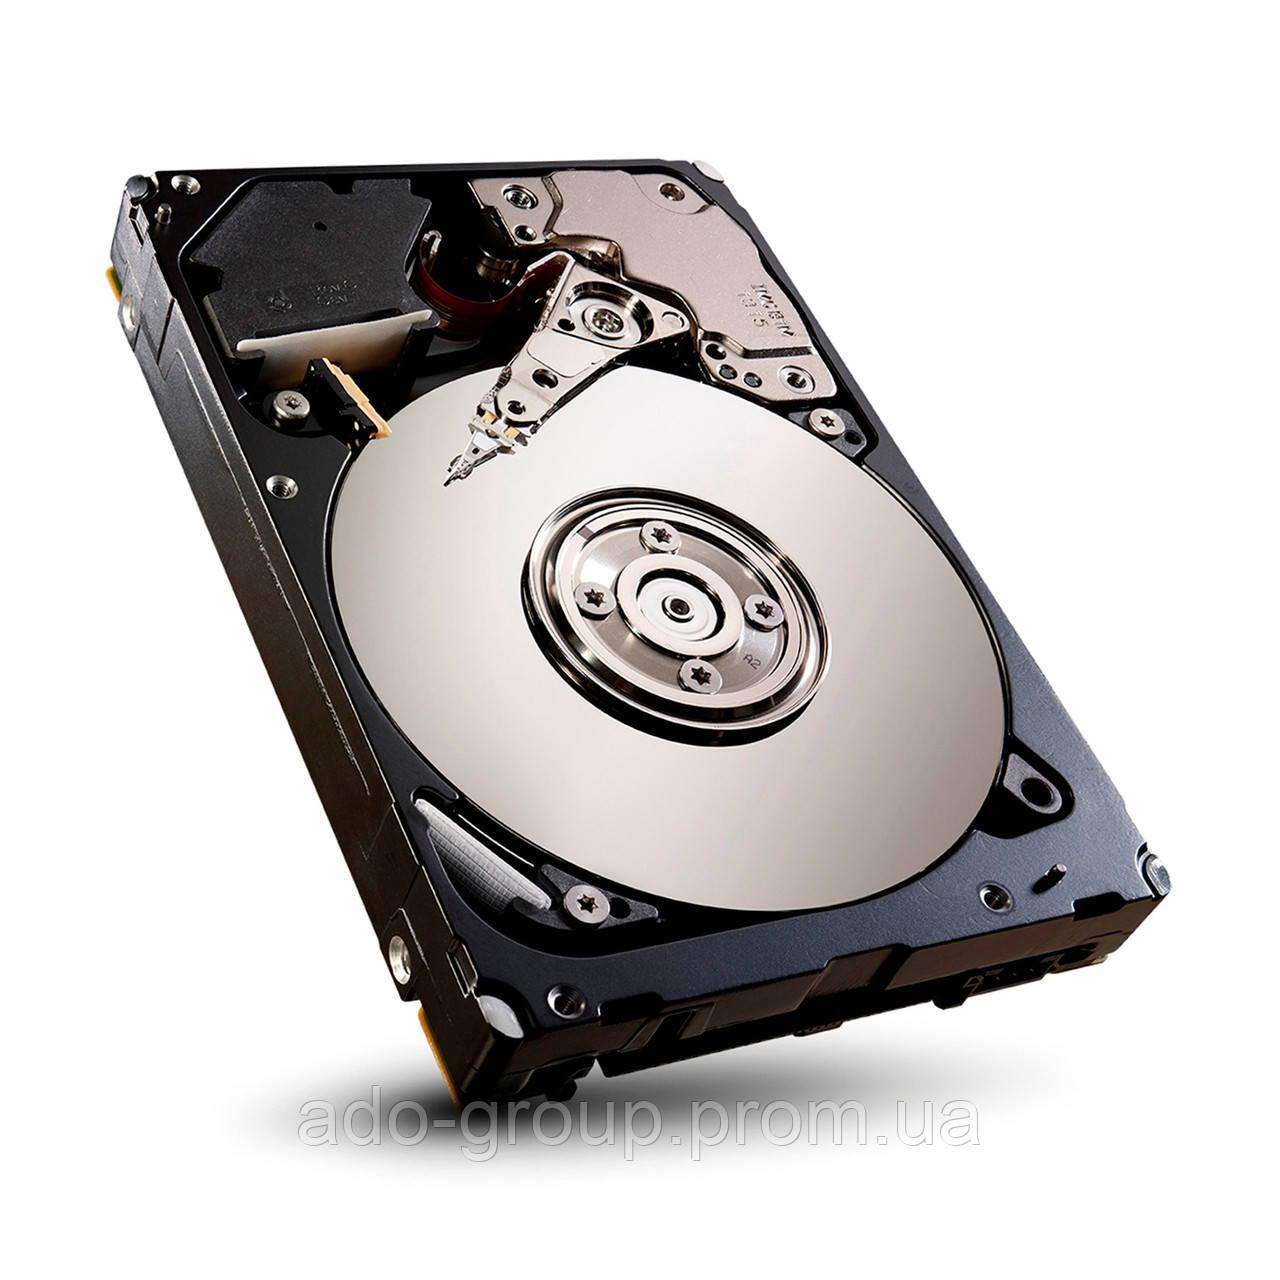 "49Y6094 Жесткий диск IBM 300Gb SAS 15K  3.5"" +"